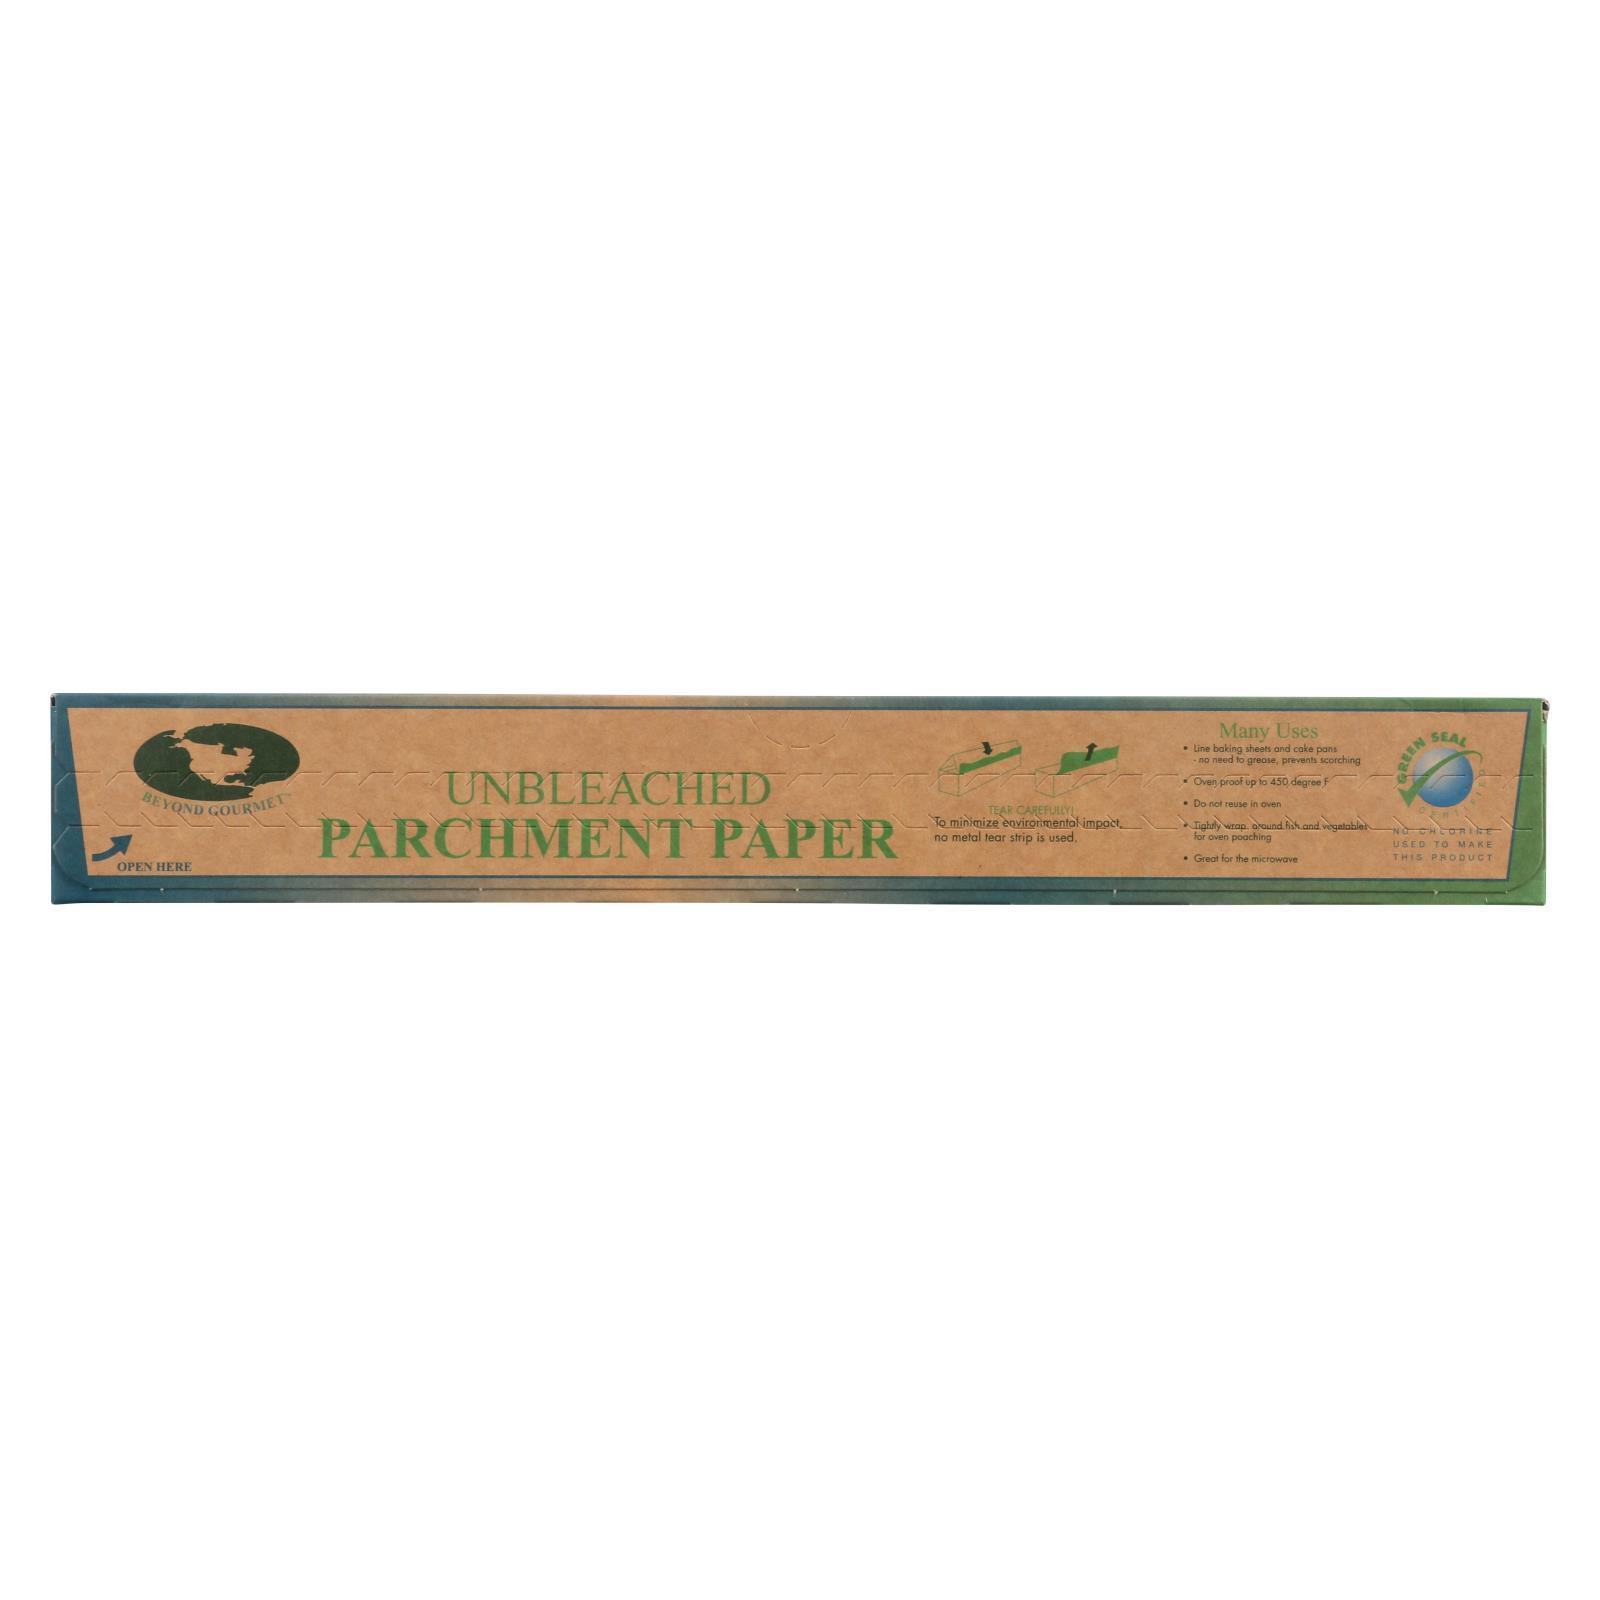 Beyond Gourmet Parchment Paper - Unbleached - 1 Roll